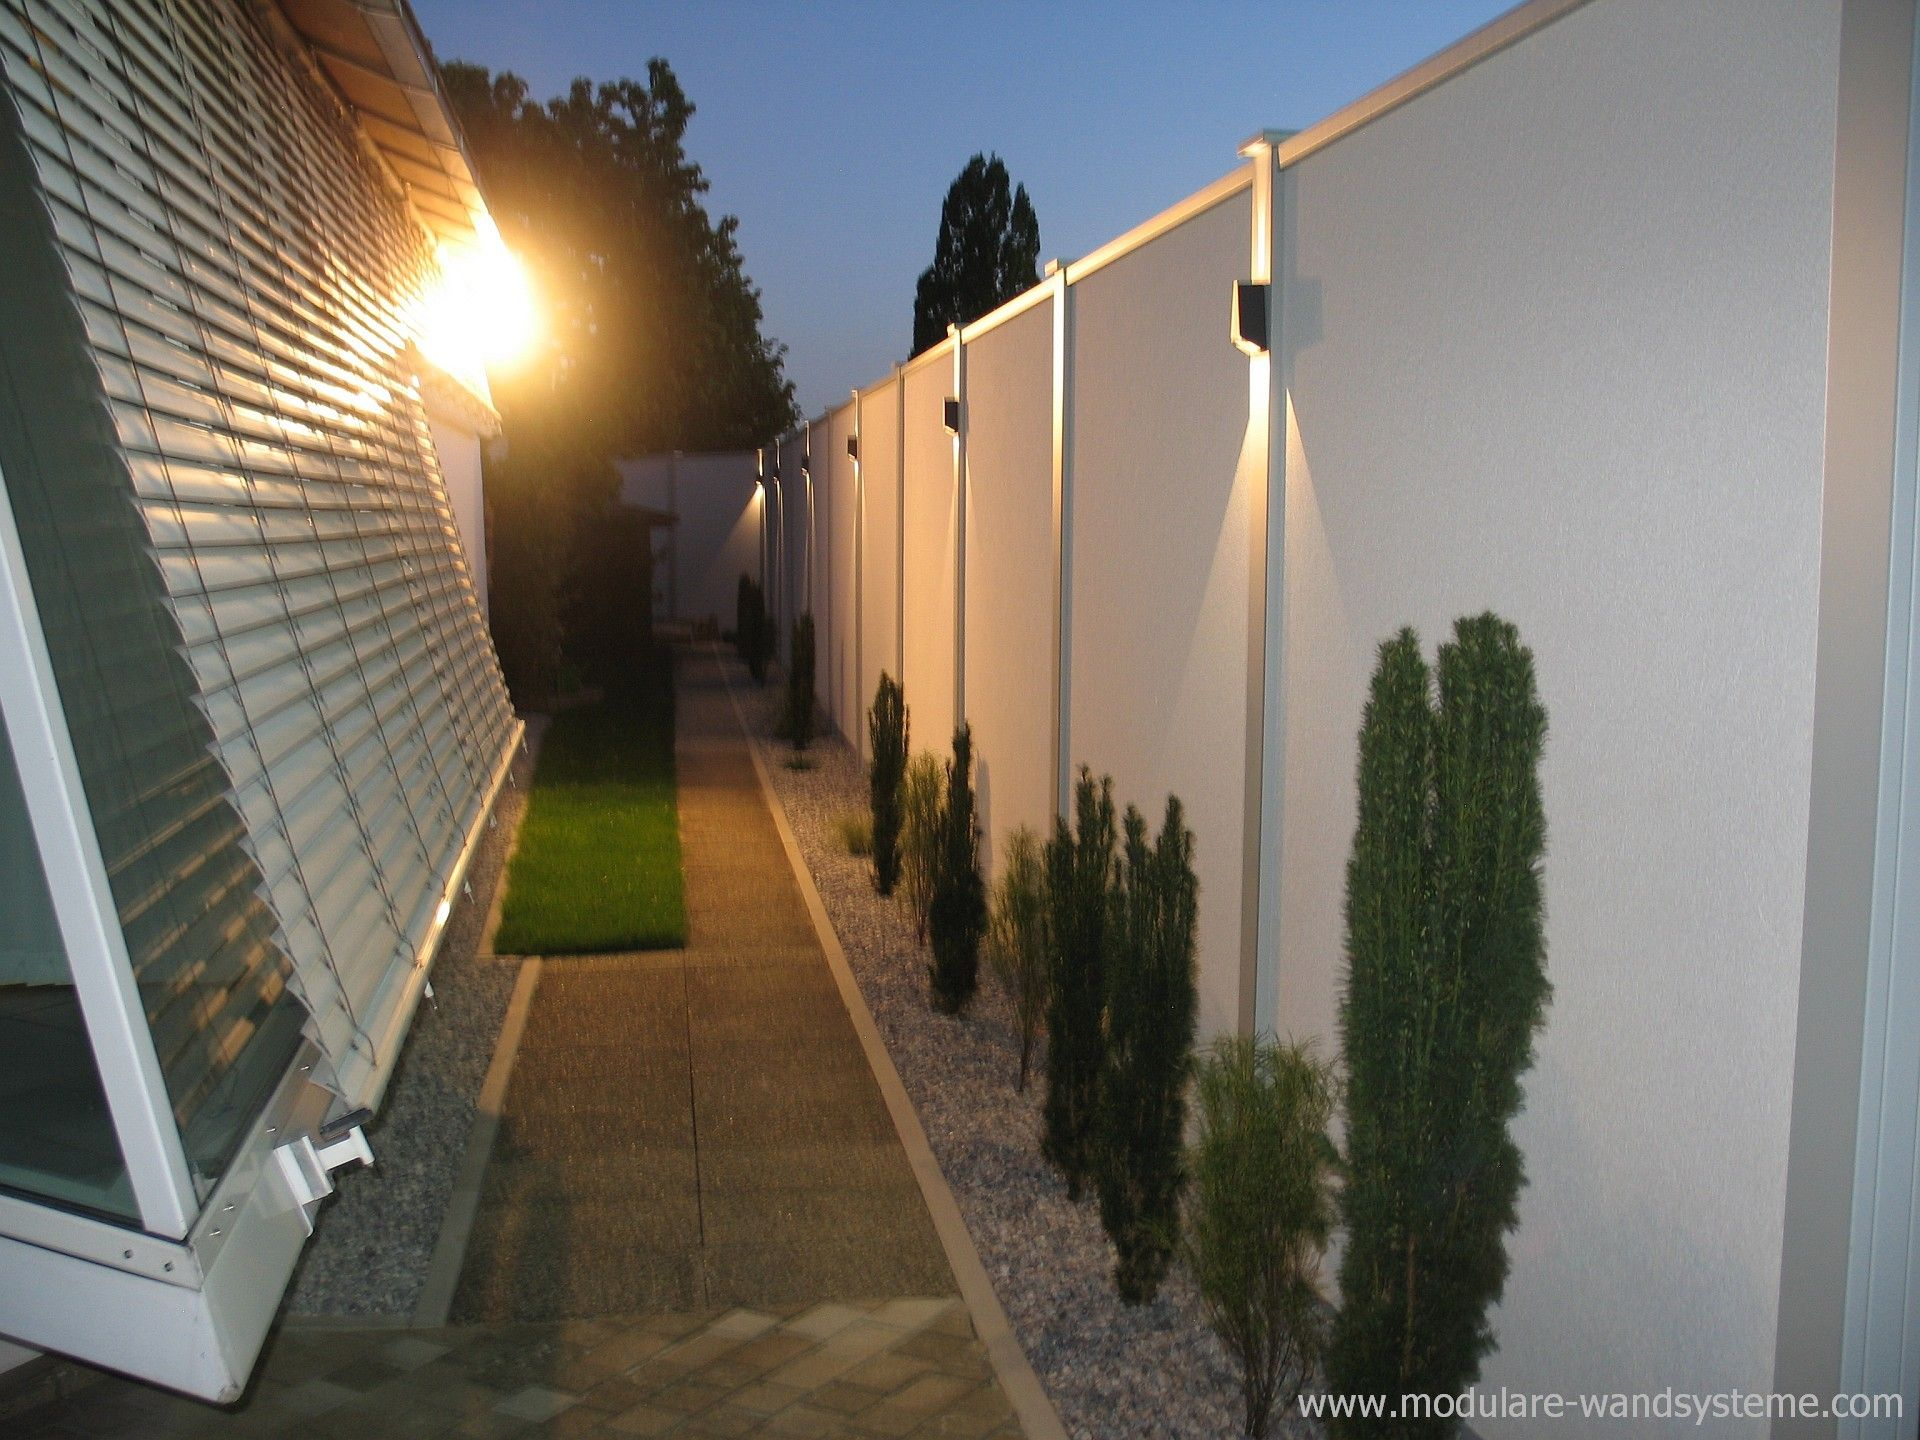 Modulare Wandsysteme Sichtschutz Larmschutz 270 Cm Hohe Mit Beleuchtung Modern Backyard Landscaping Home Garden Design Modern Backyard